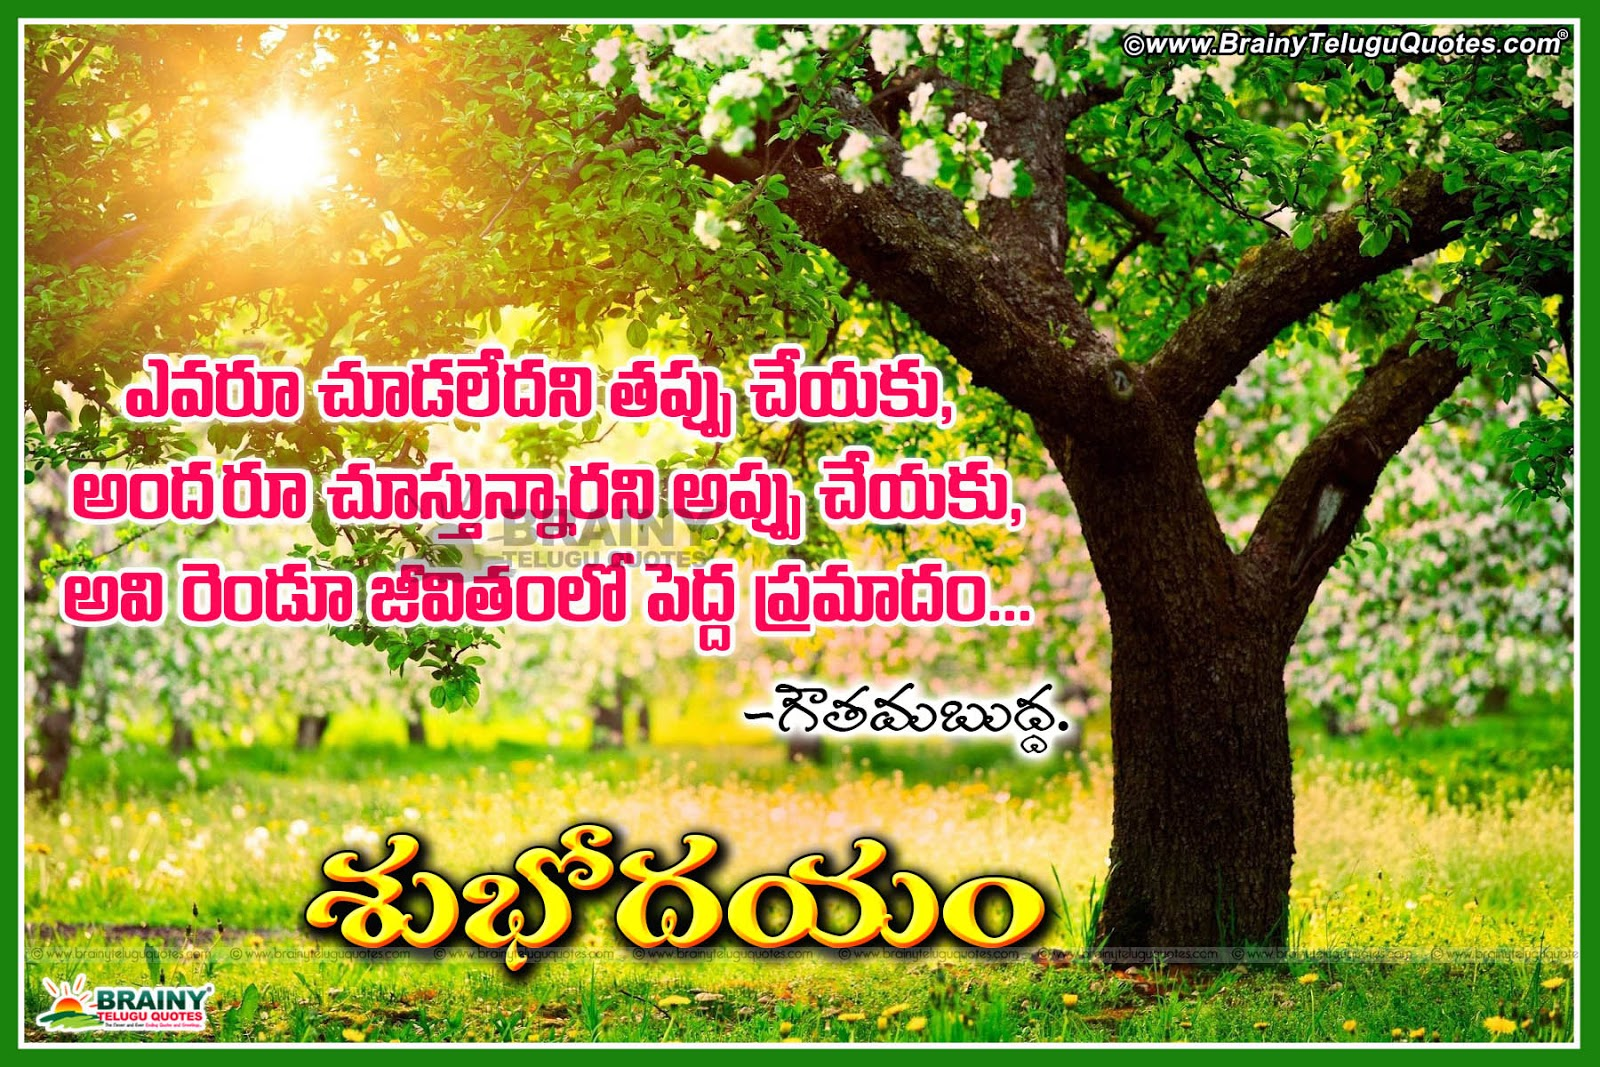 Vinayaka Chavithi Hd Wallpapers Subhodayam Images Telugu Good Morning 3d Wallpapers